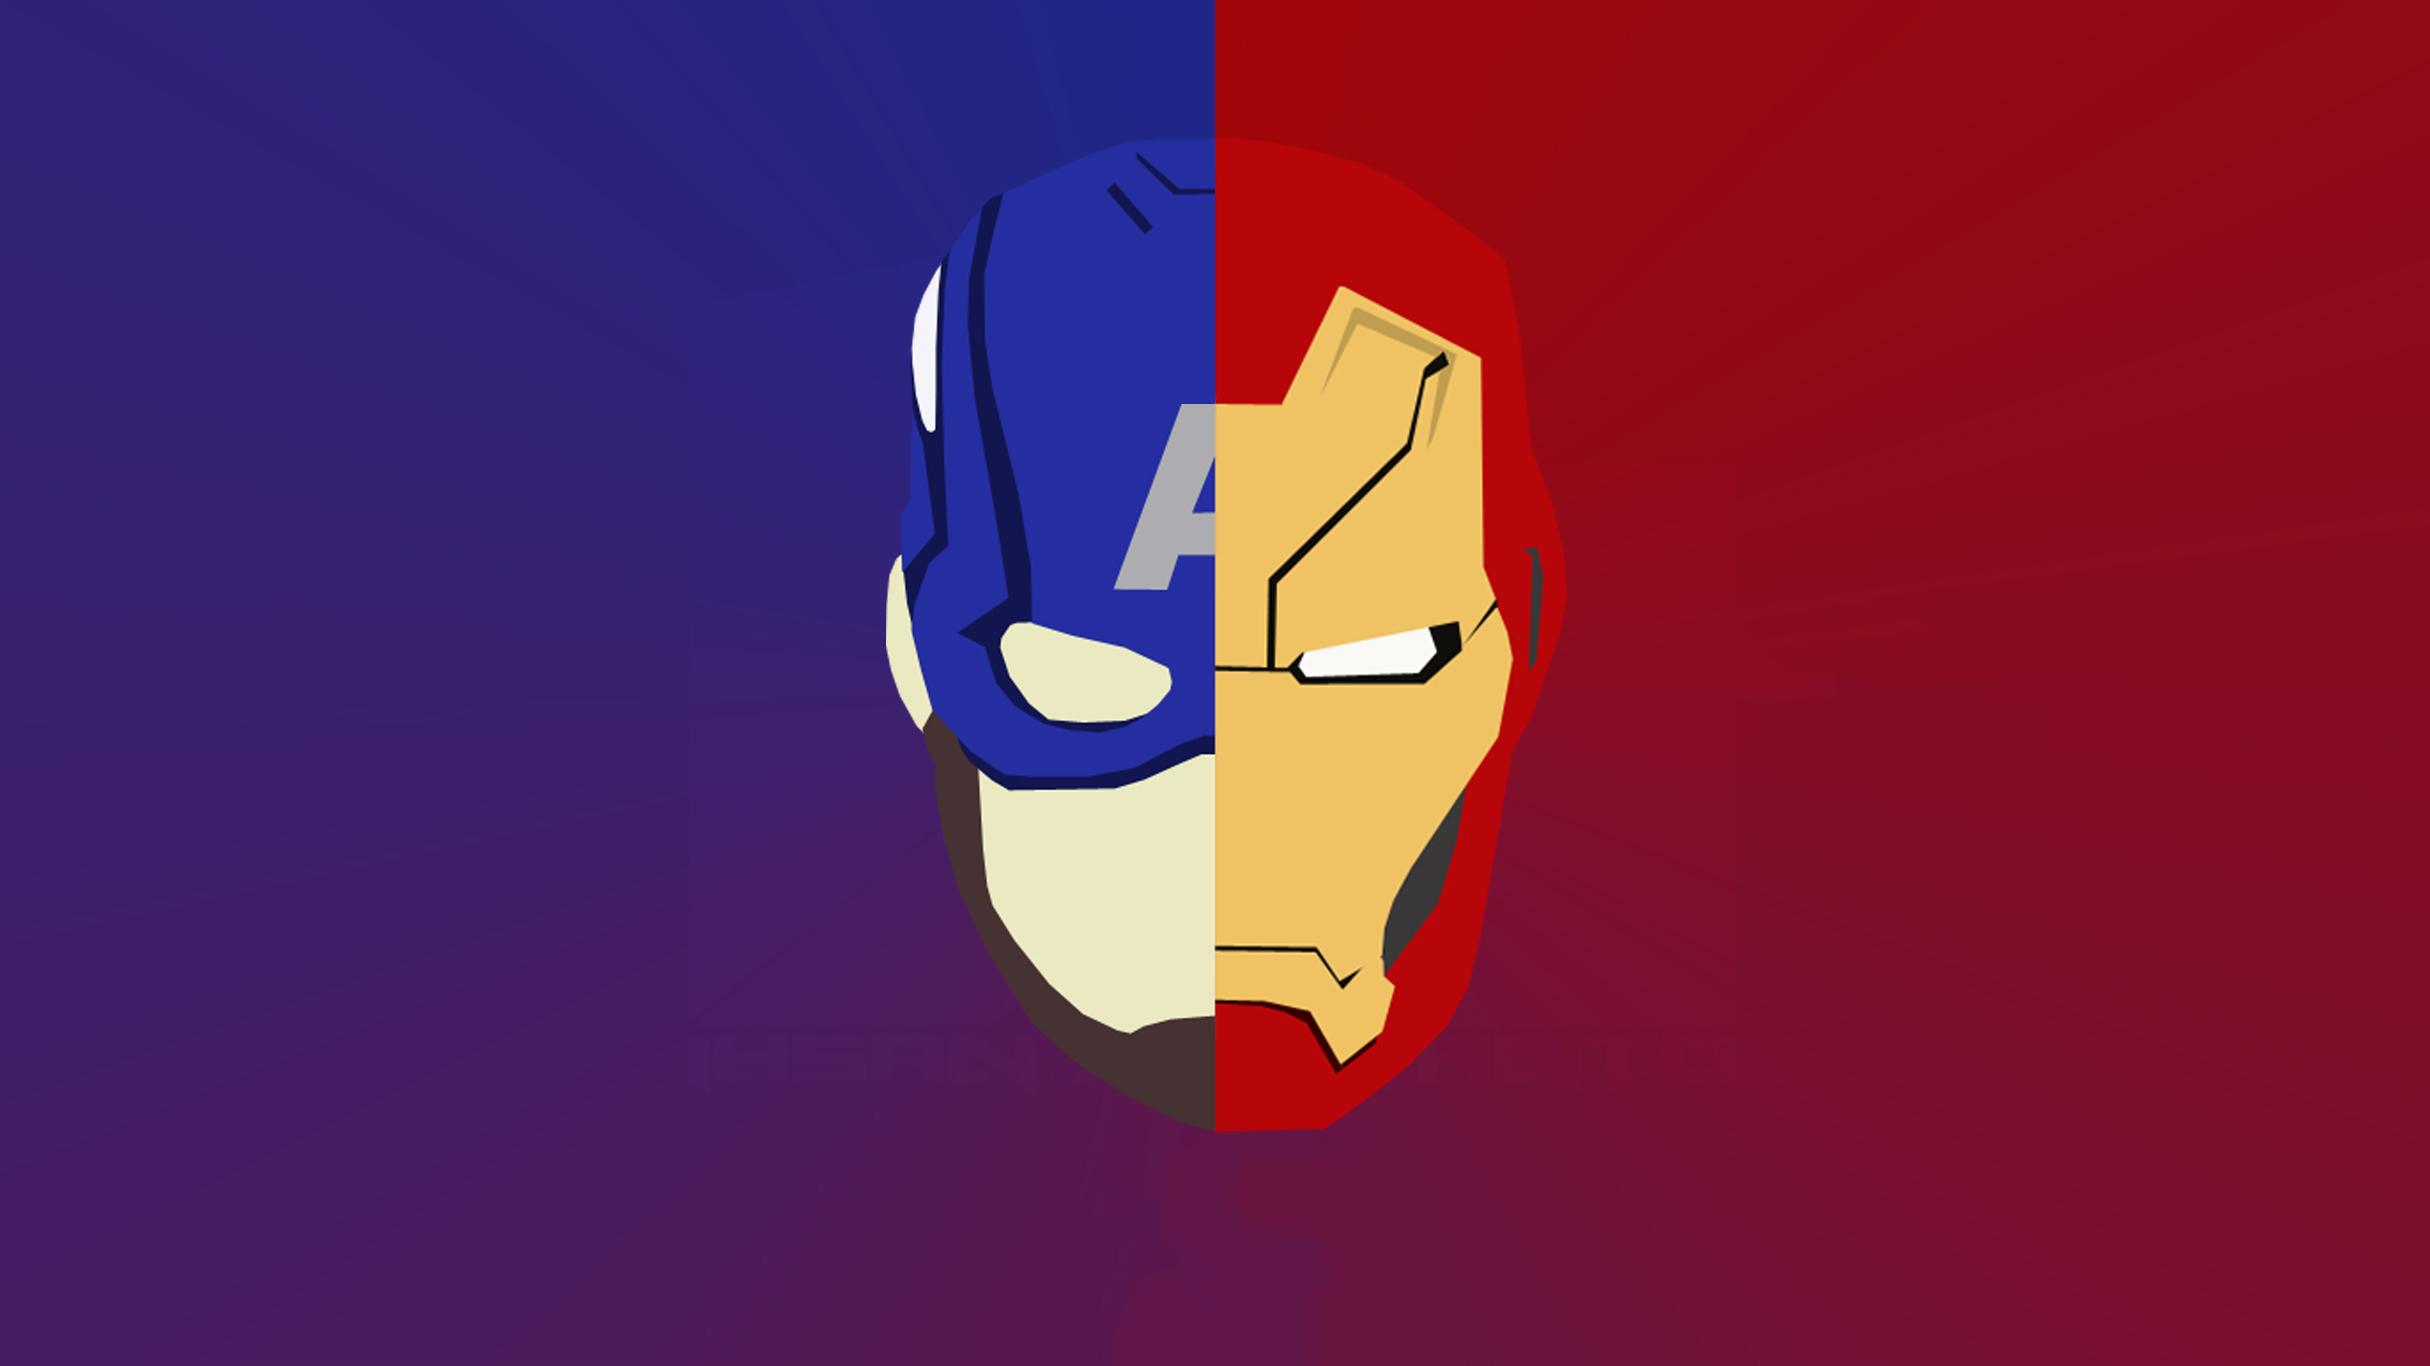 1080x1920 Iron Man And Captain America Artwork Iphone 7 6s 6 Plus